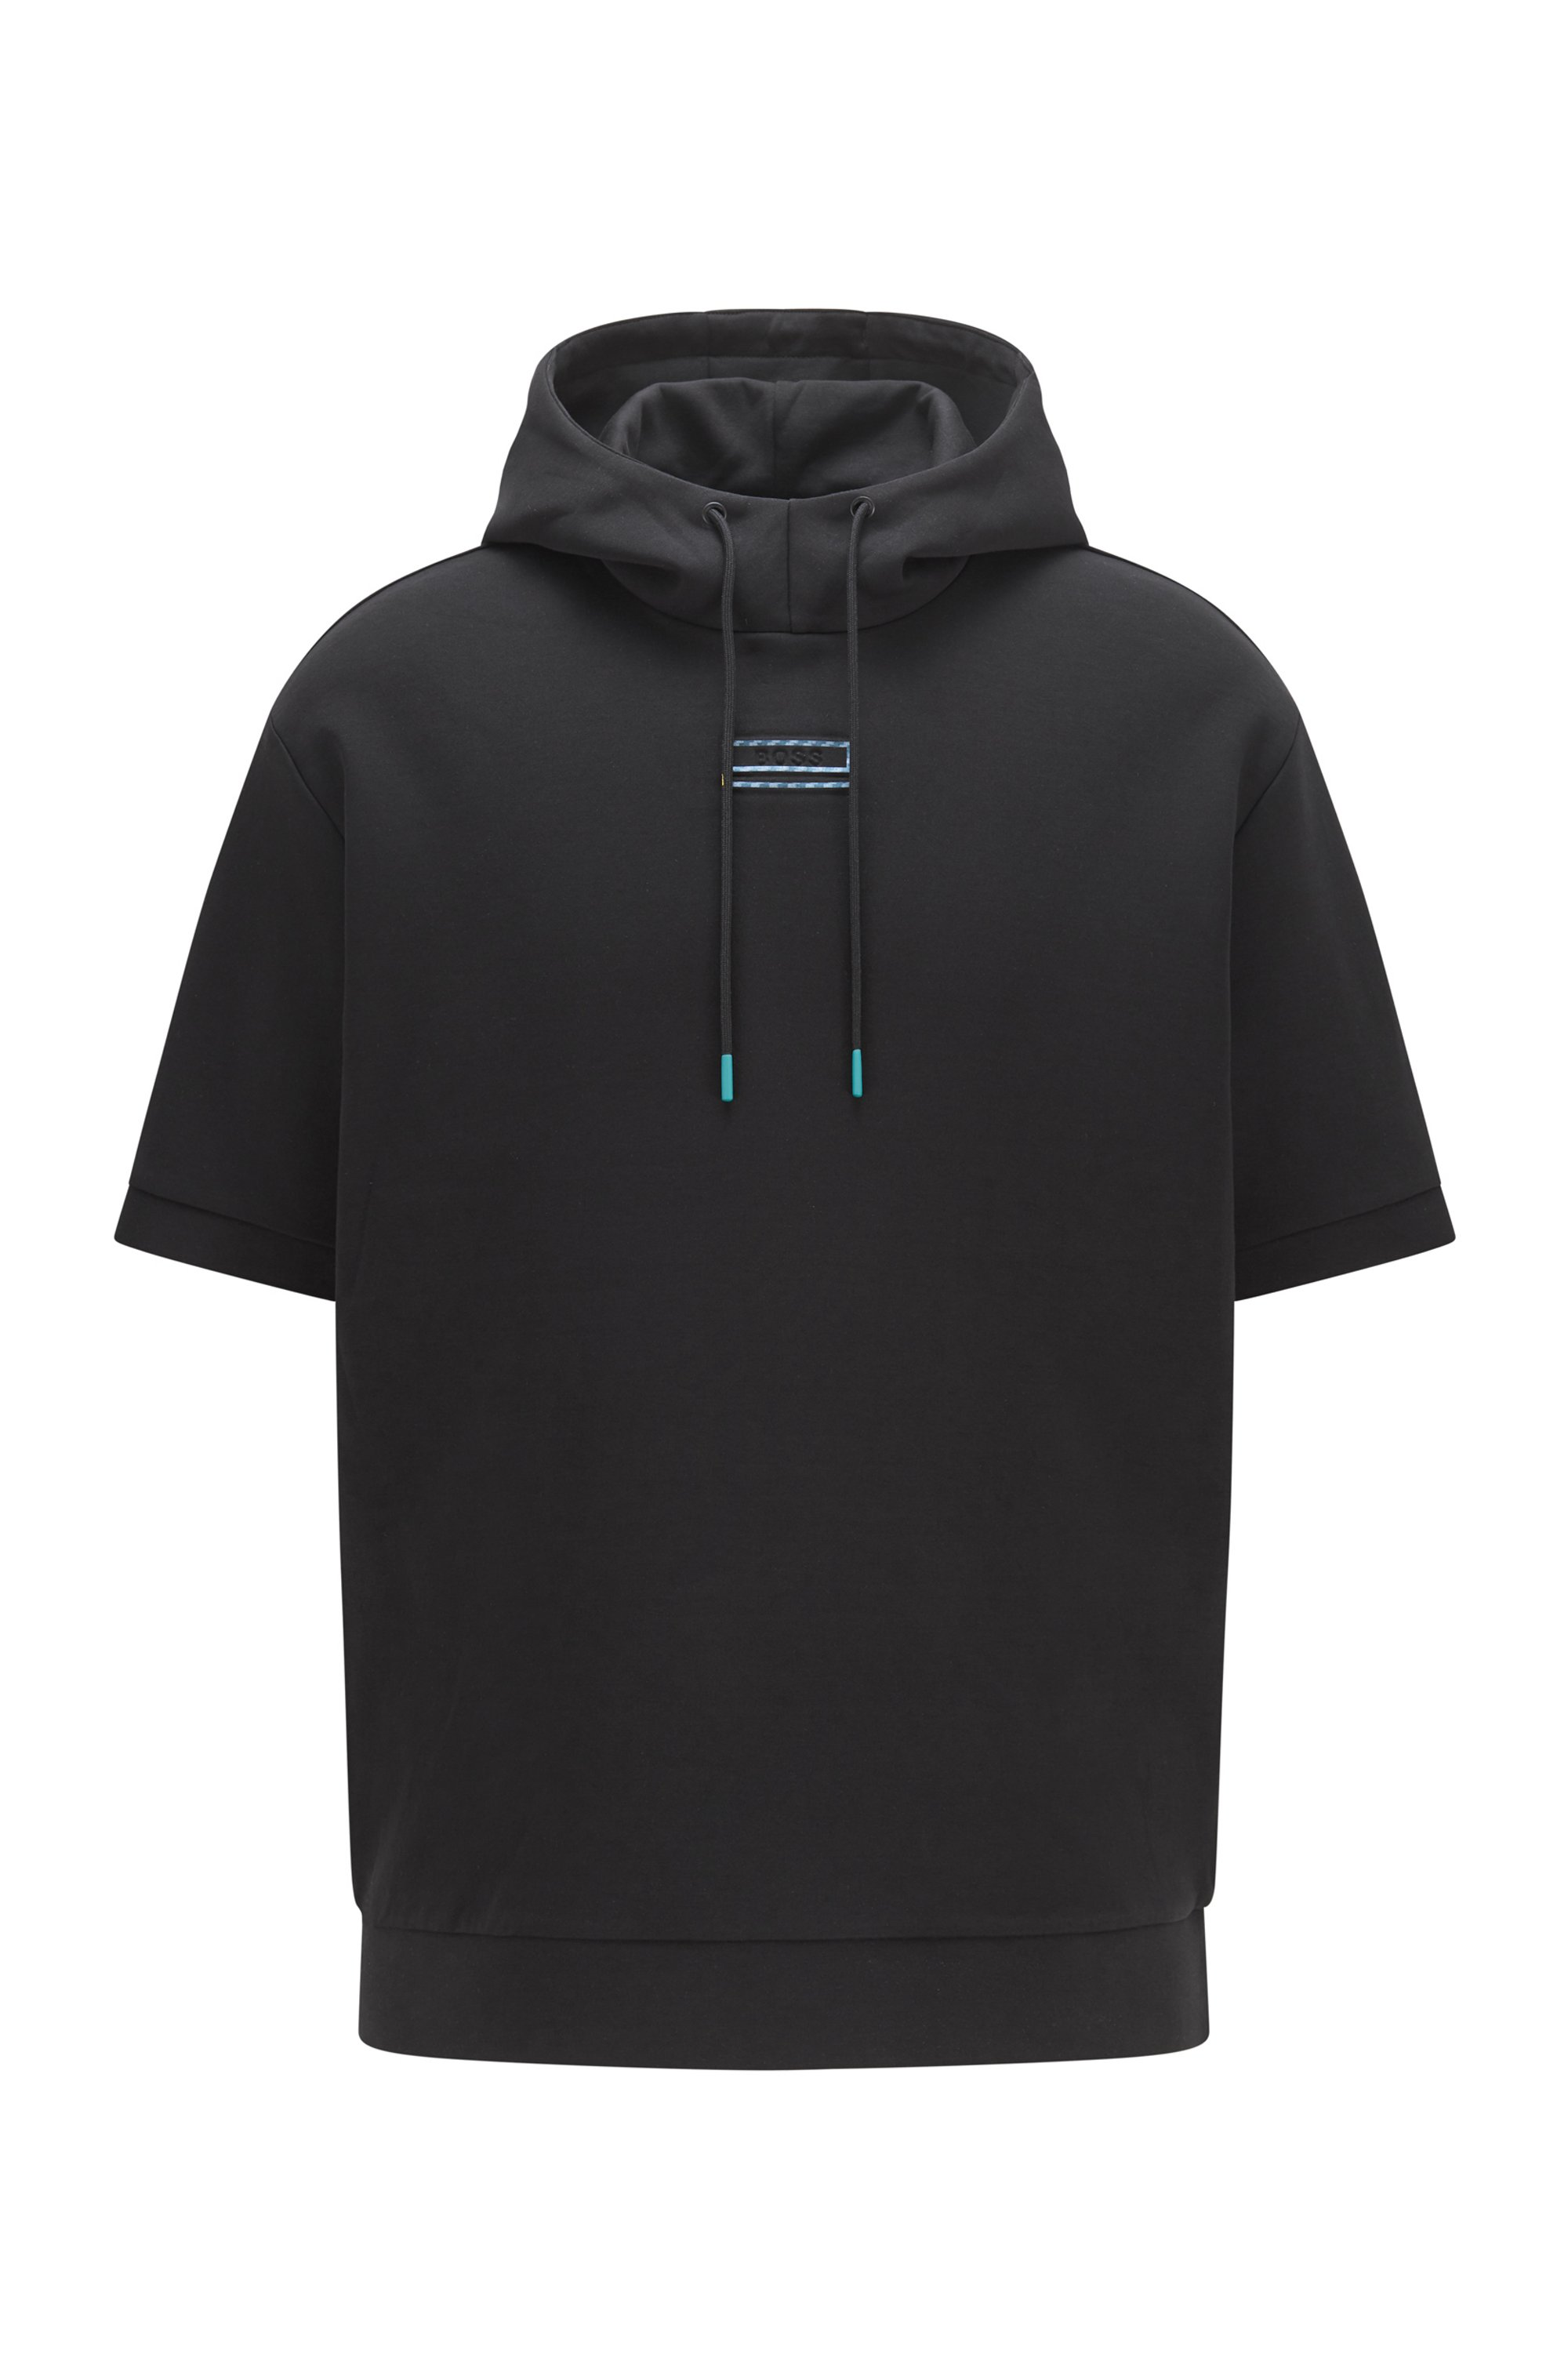 Short-sleeved hooded sweatshirt with carbon-effect logo detail, Black